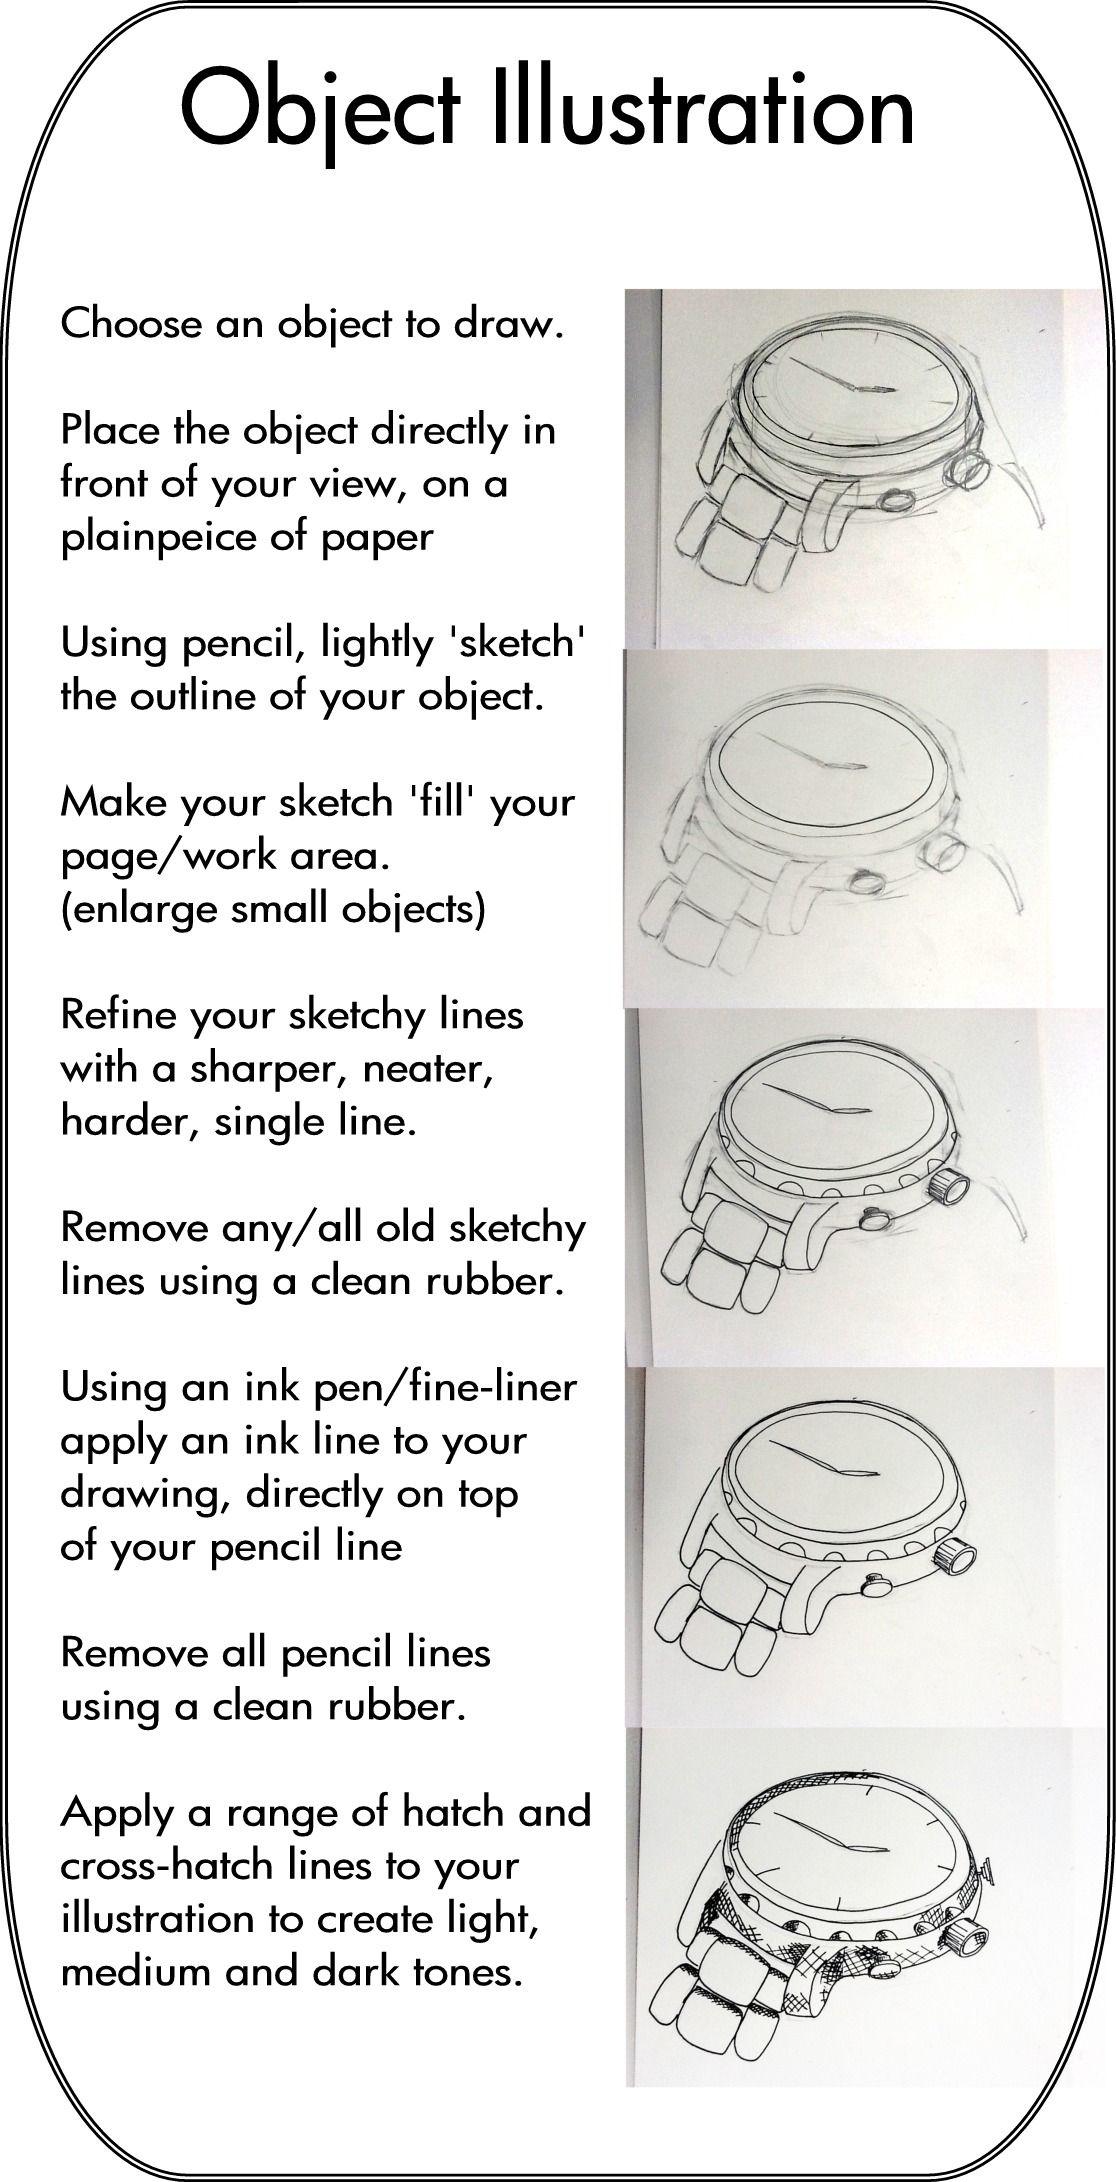 Object Illustration guidance